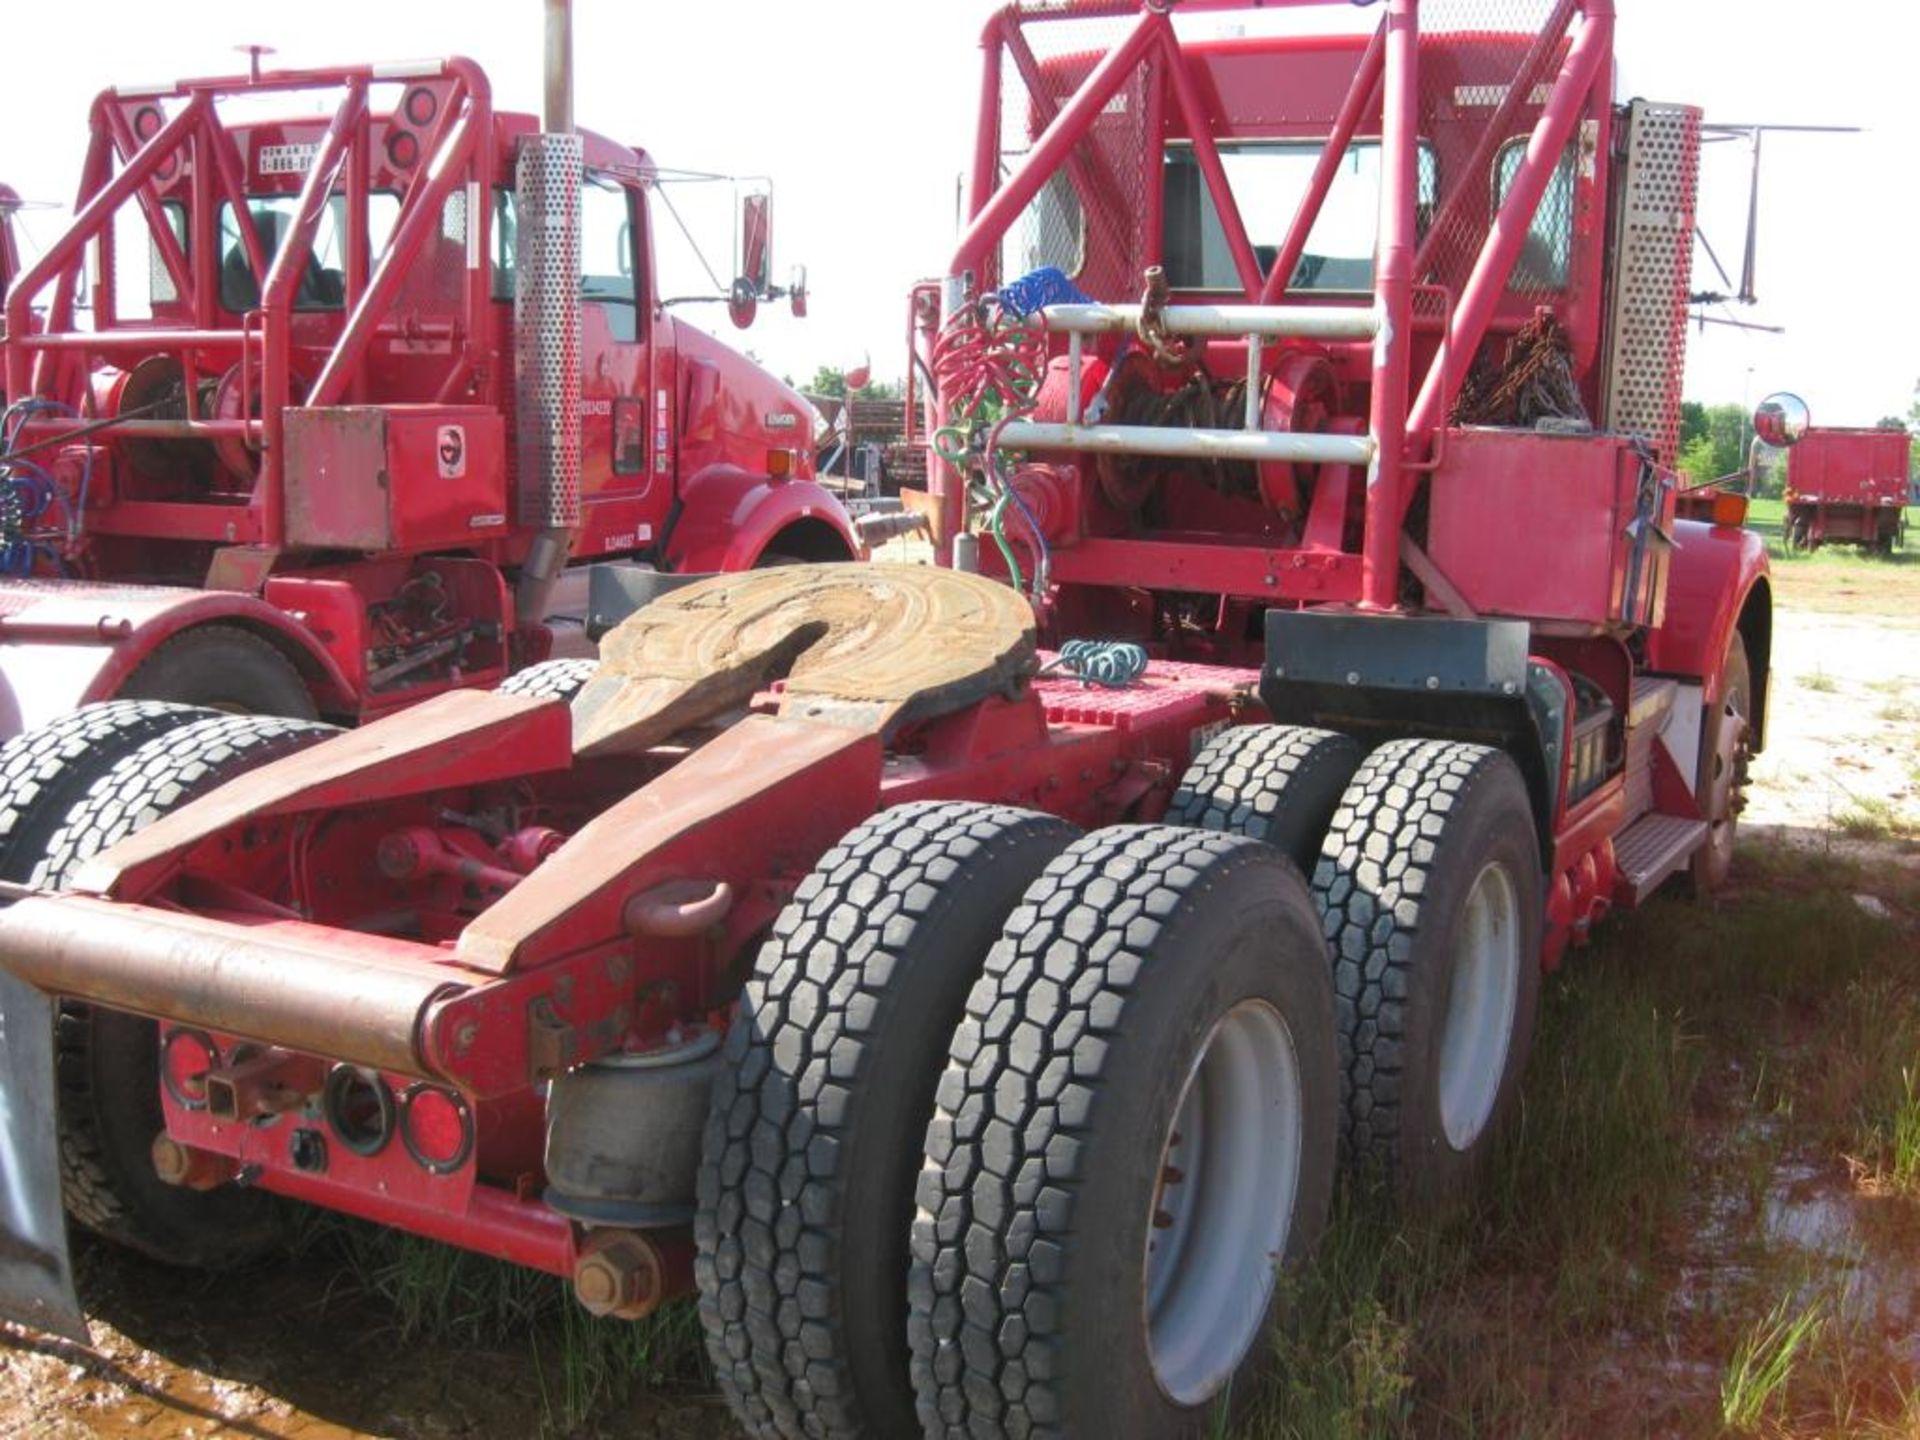 Kenworth Winch Truck - Image 6 of 27